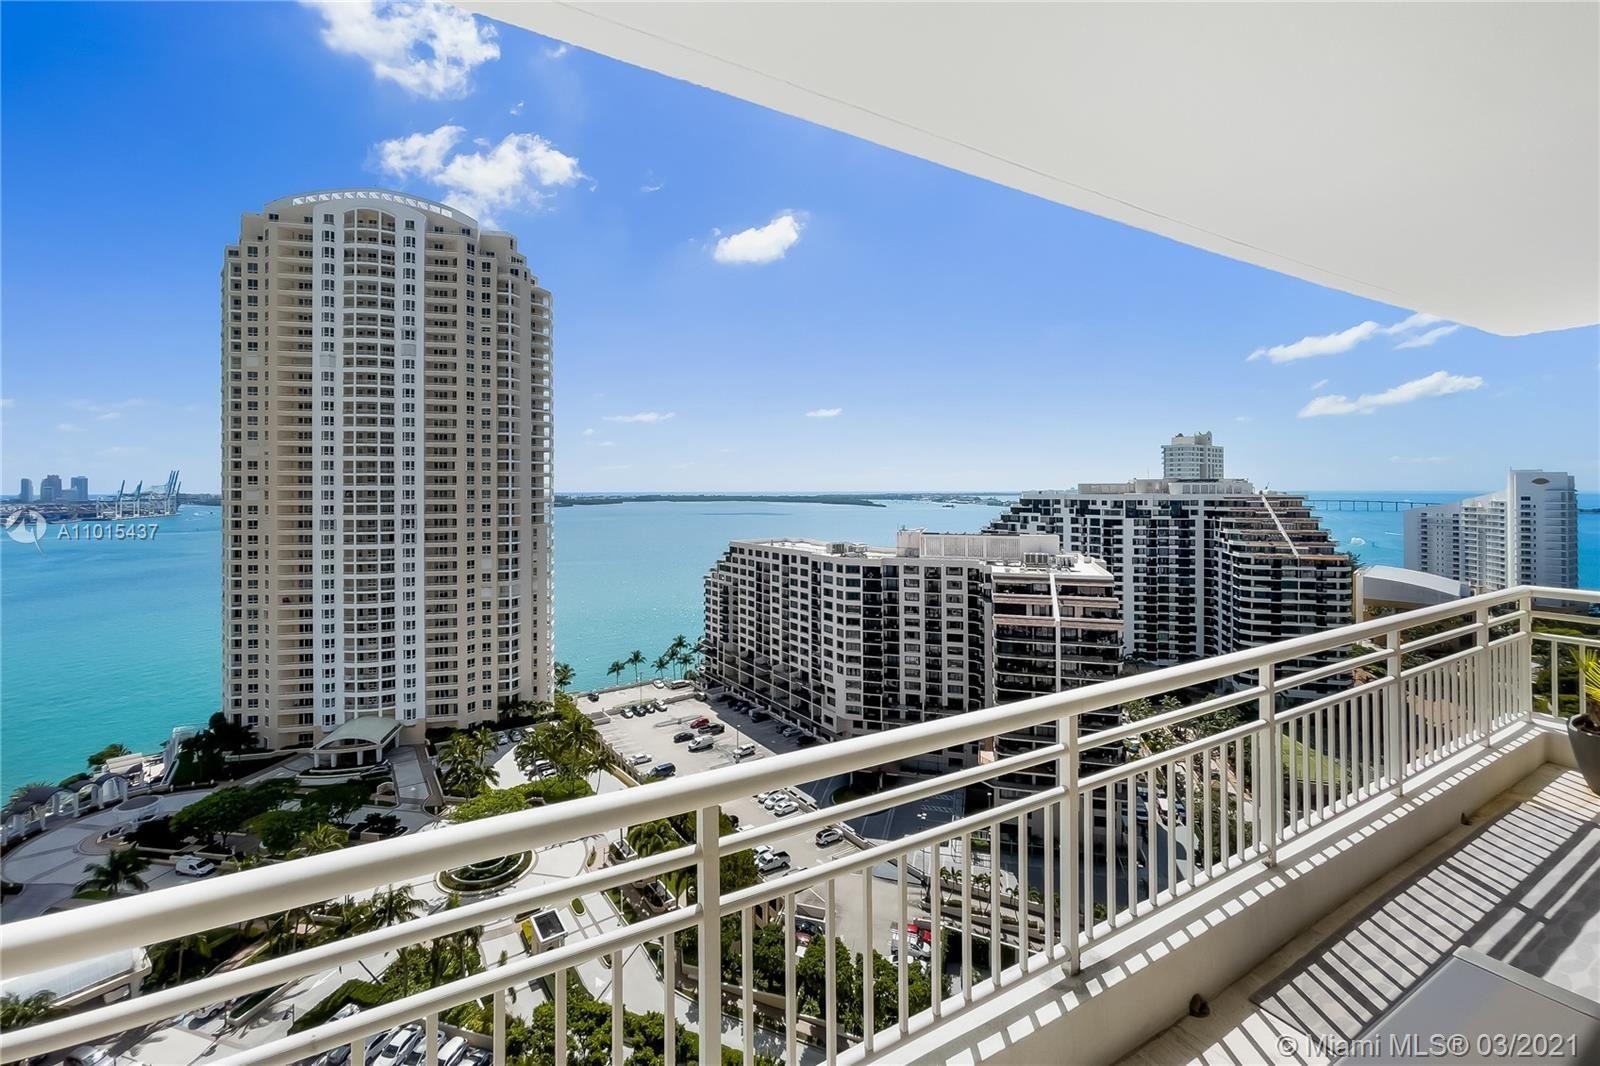 888 Brickell Key Dr #2307, Miami, FL 33131 - #: A11015437